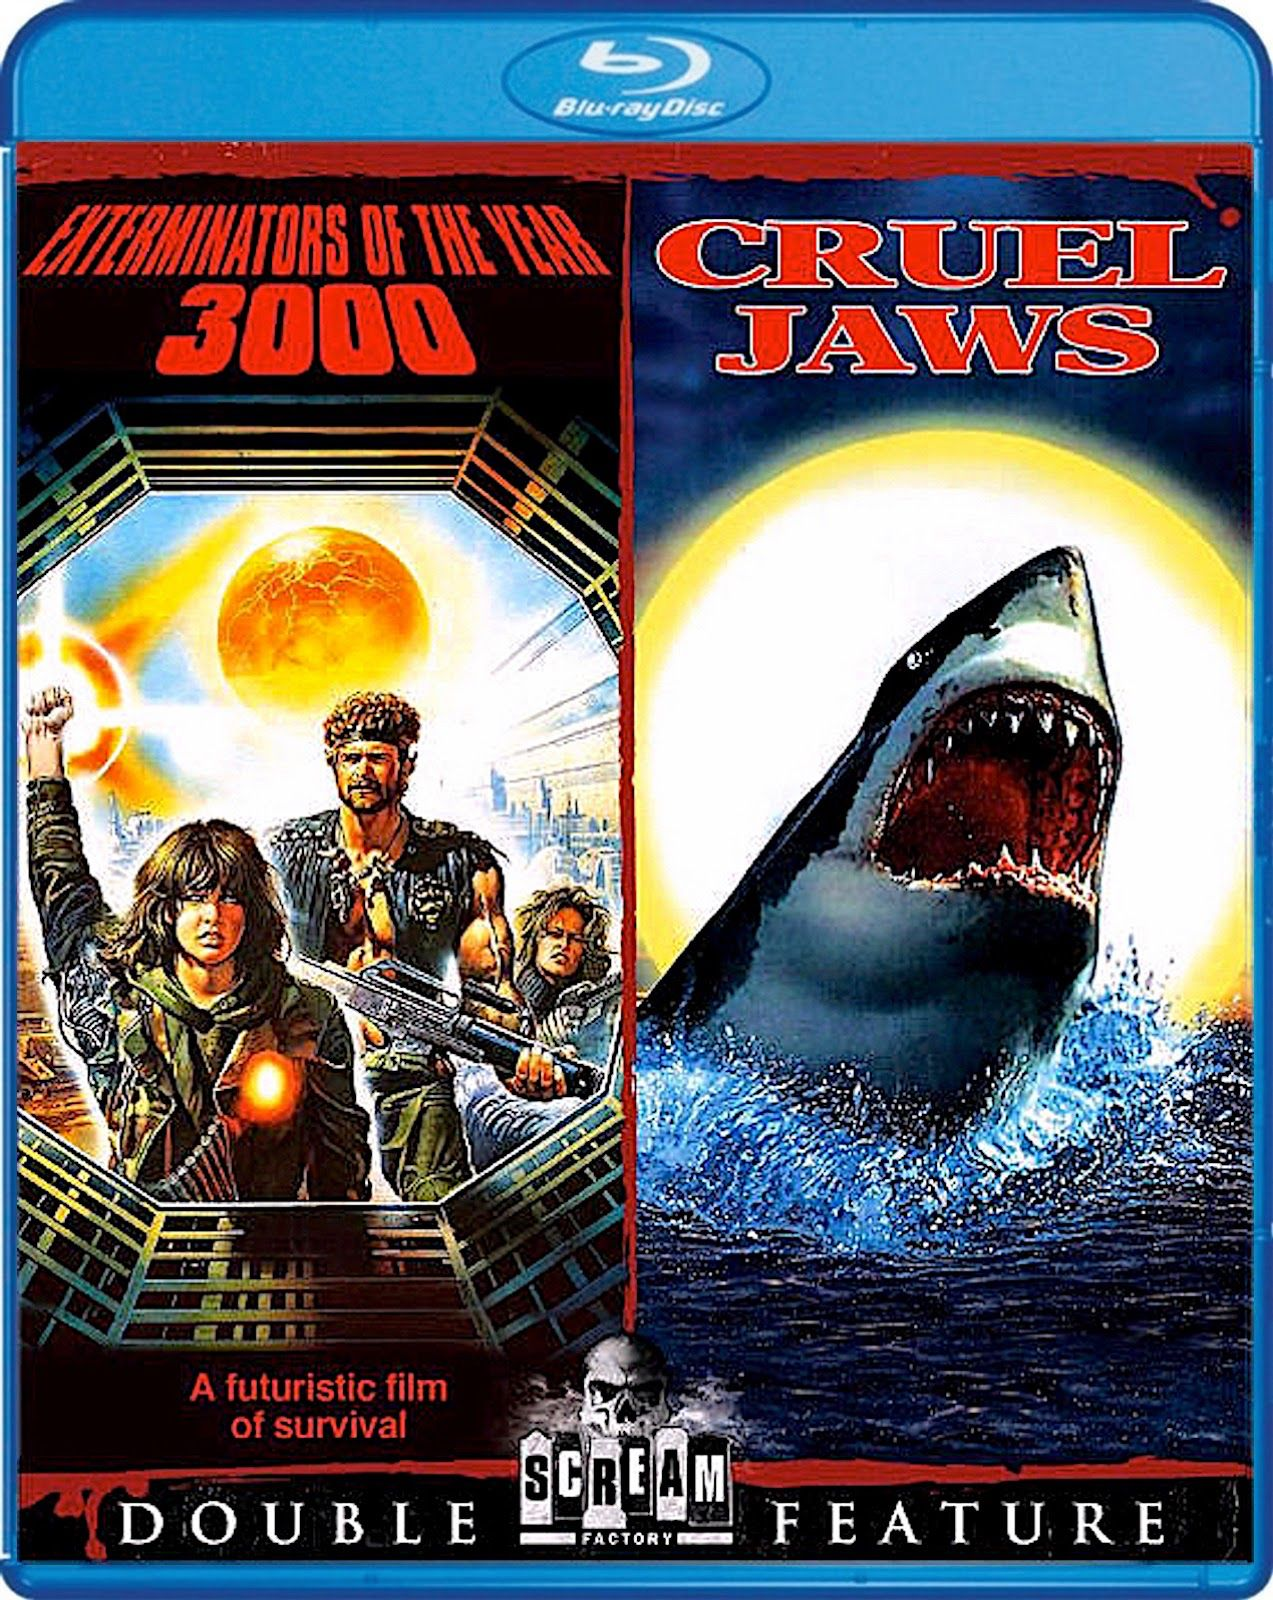 ELIMINATORS OF THE YEAR 3000 / CRUEL JAWS BLURAY SCREAM